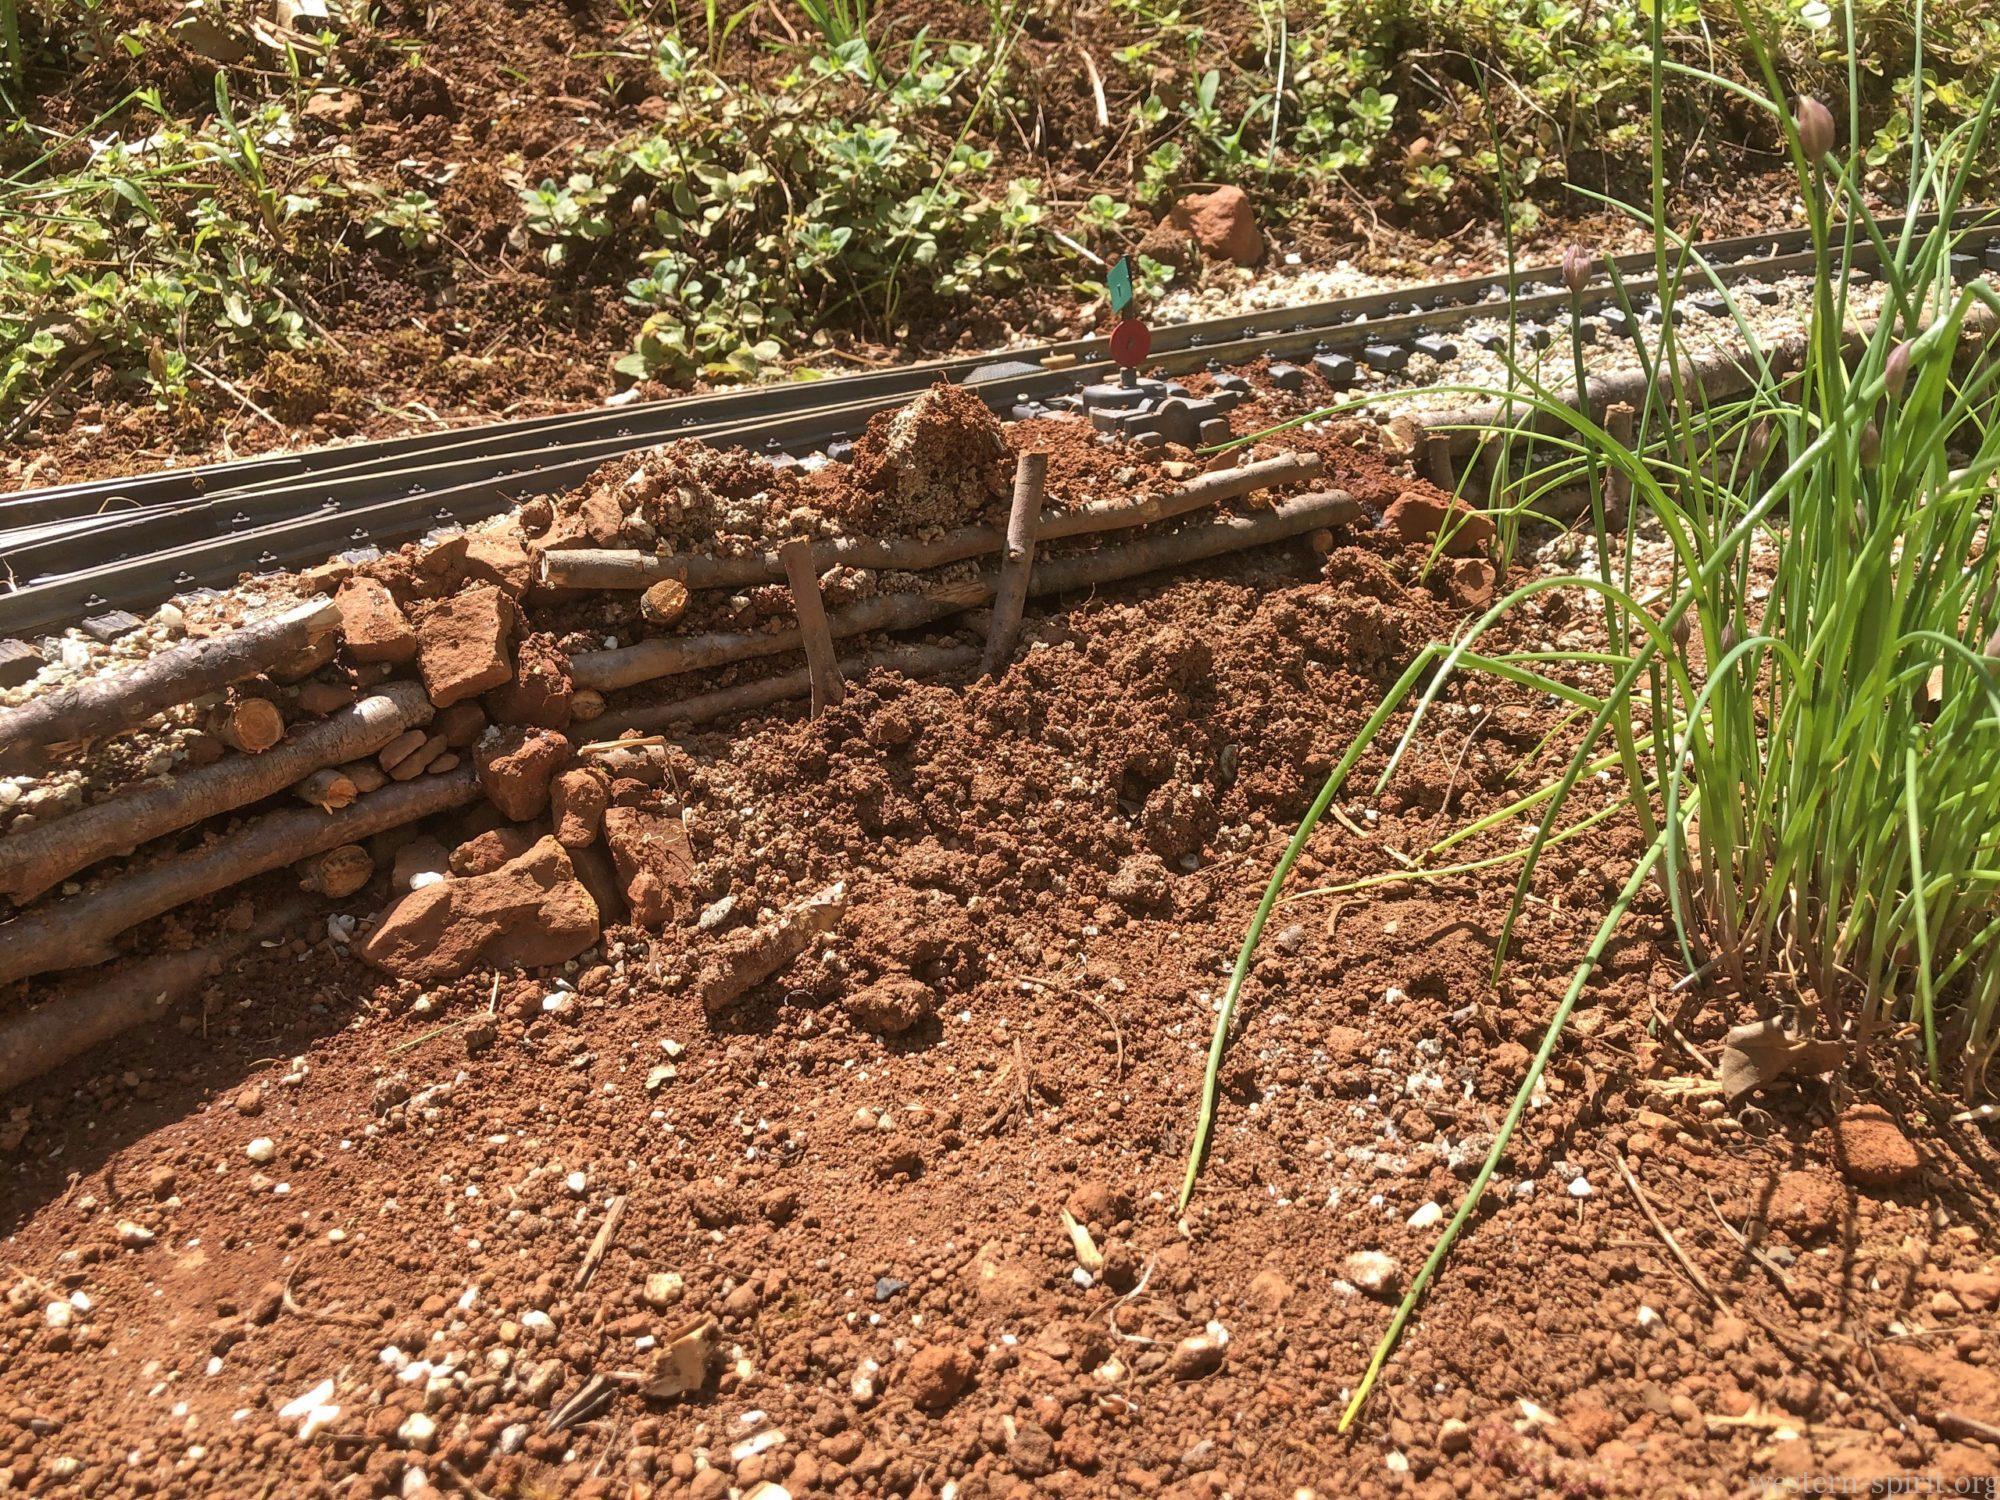 Mole damage to railroad